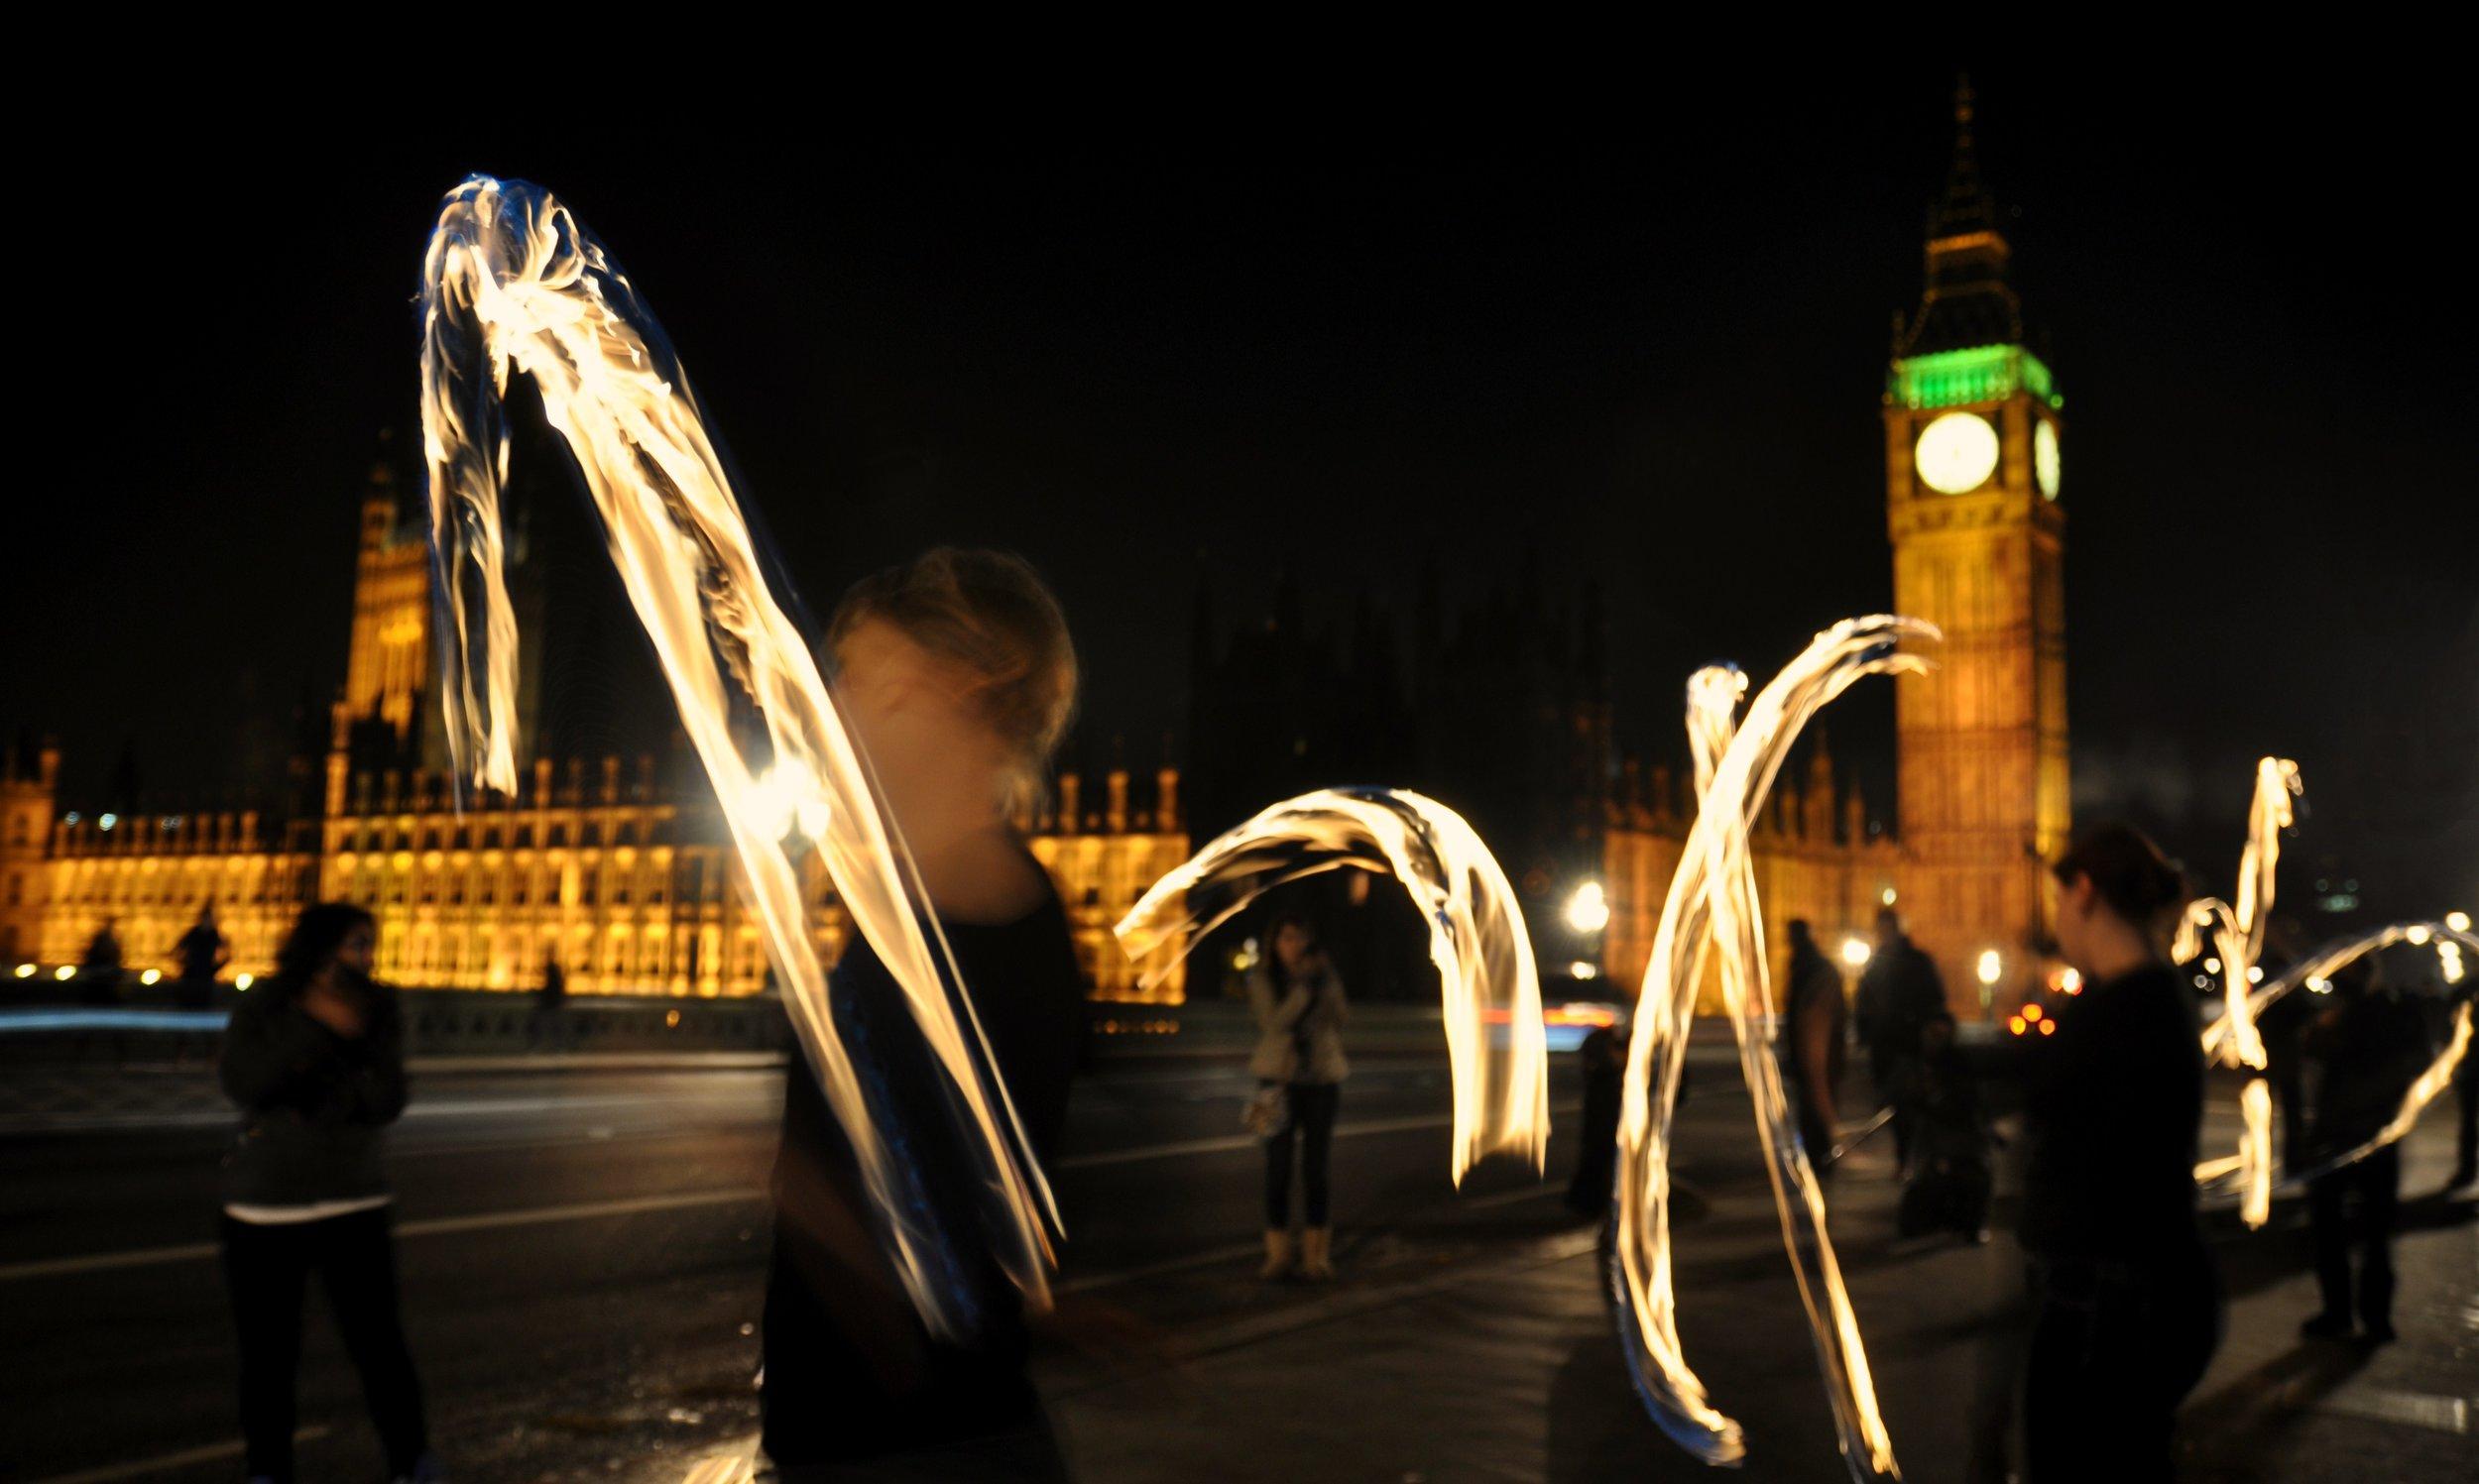 Poi Attack at Big Ben Westminster Bridge, Guy Fawkes